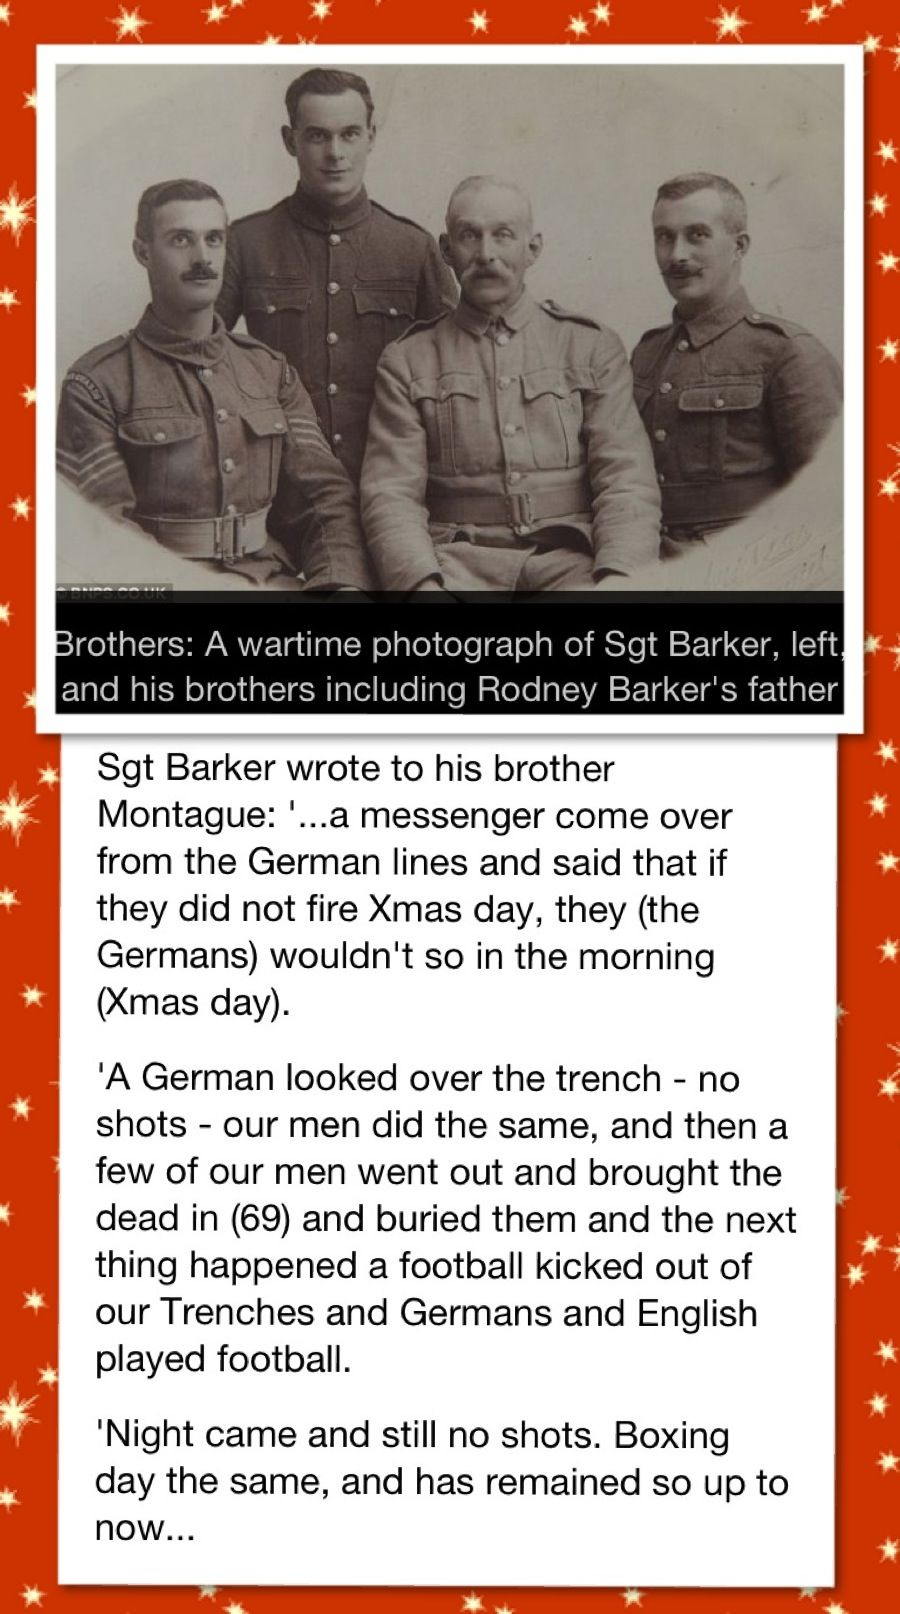 Pin by Pamela Lee on 1914 Christmas Truce | Pinterest | Christmas truce